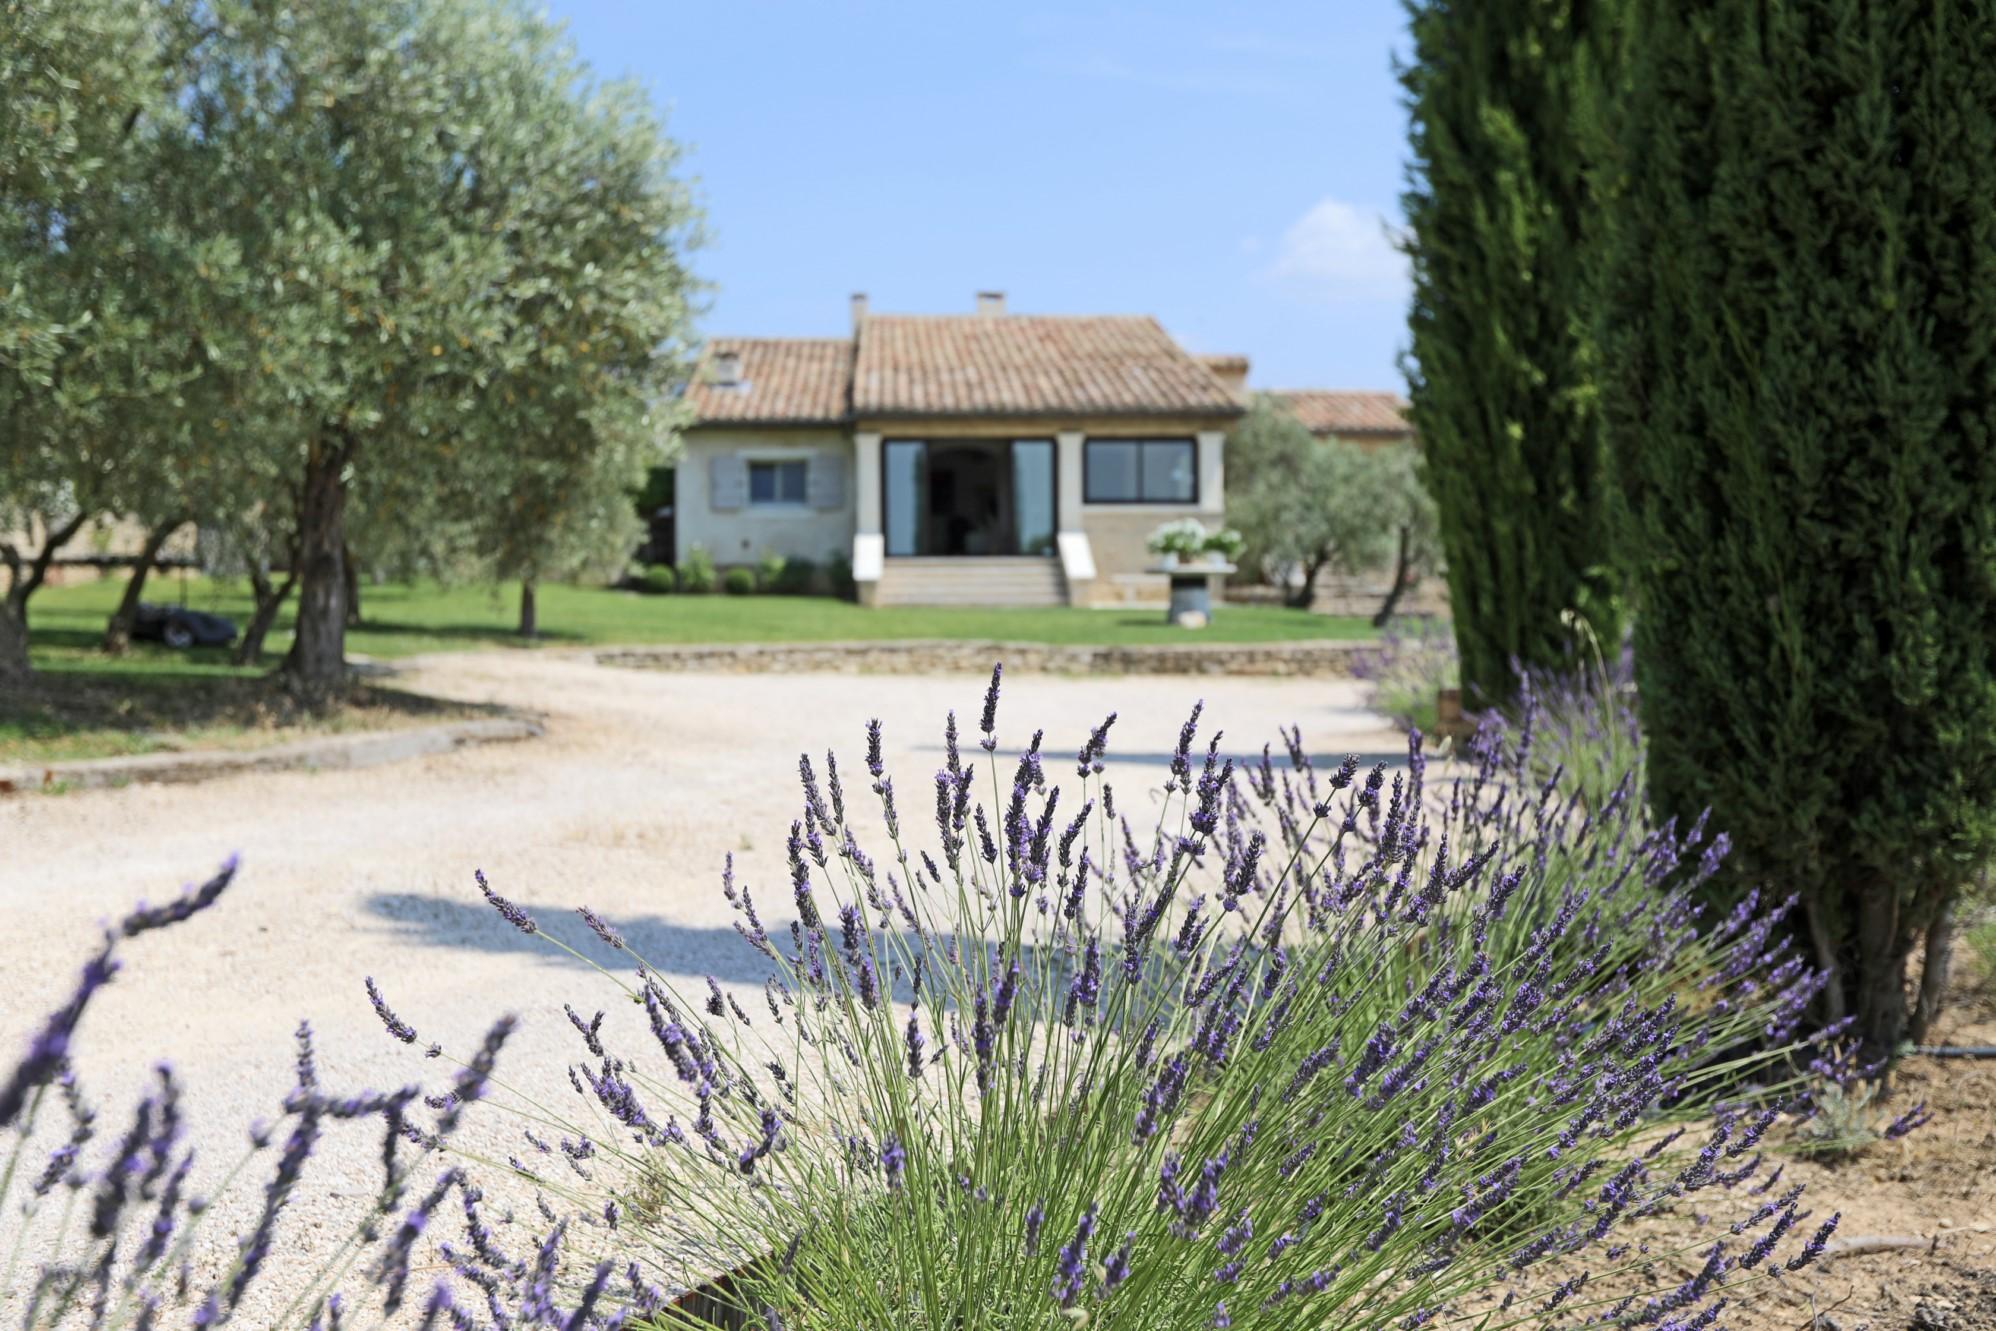 Jardin paysager et essences Provençales